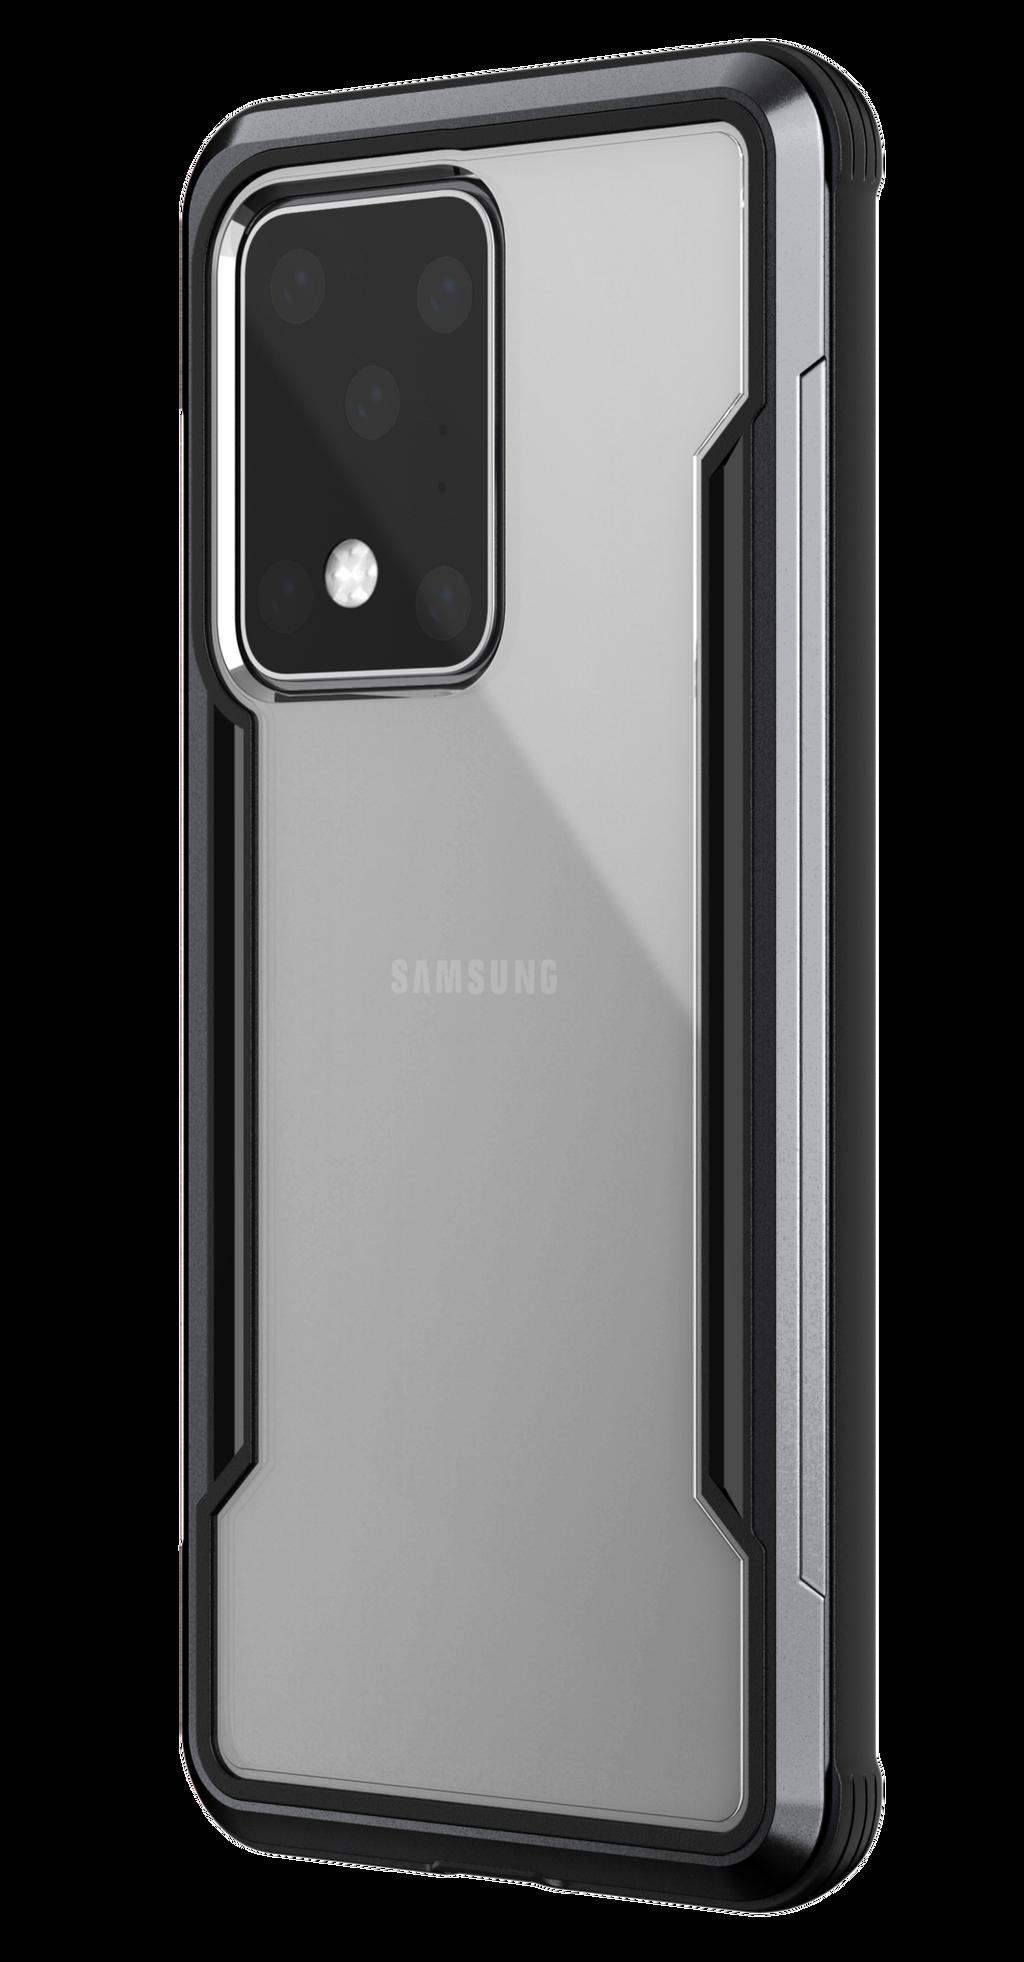 Samsung_S11plus_Shield_Quarter_Back_black_1024x1024@2x.png